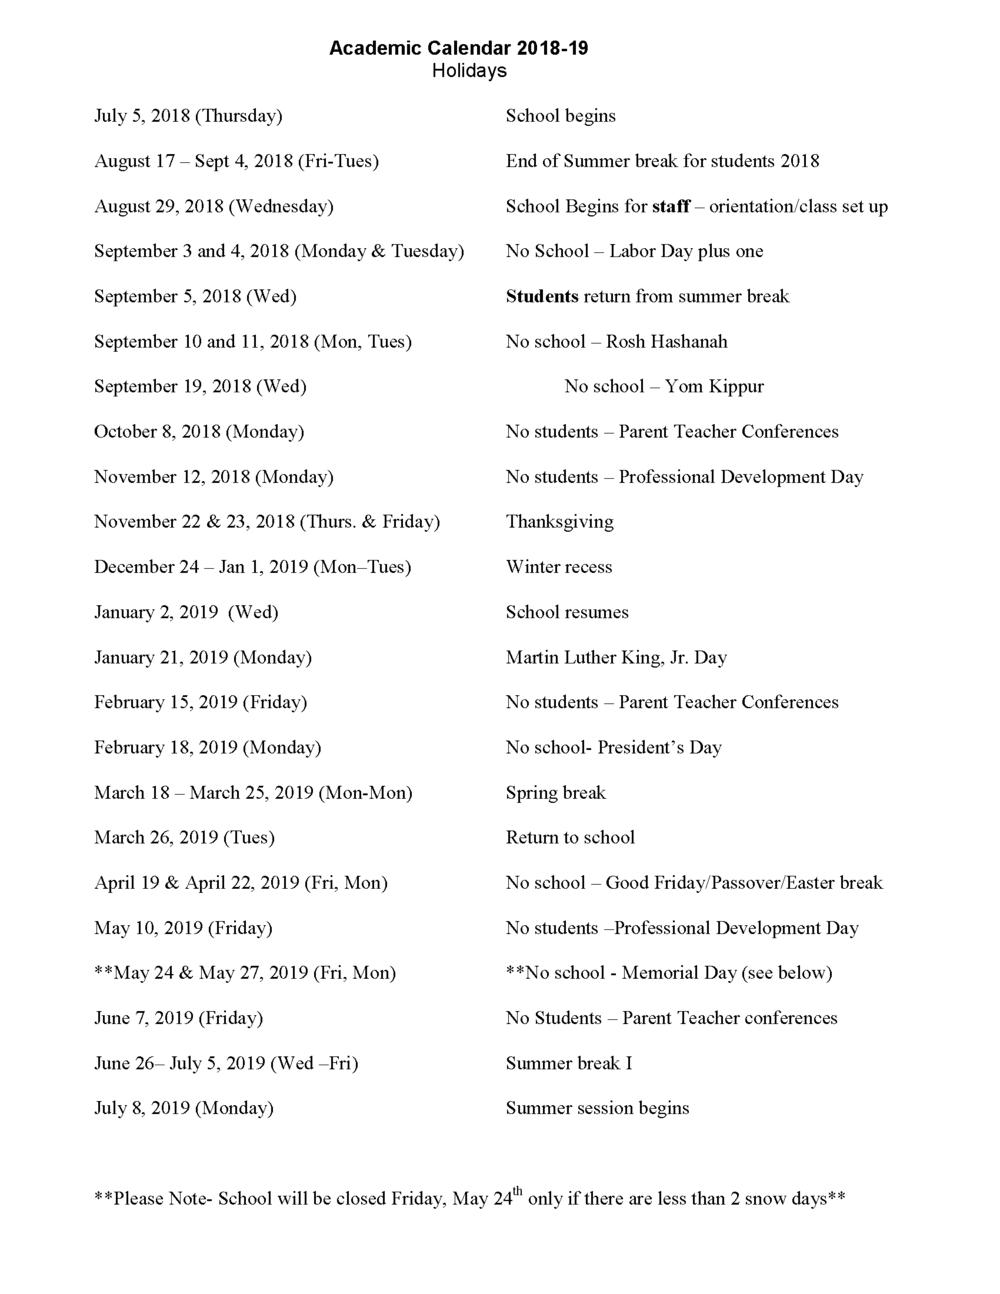 academic calendar 18-19.png